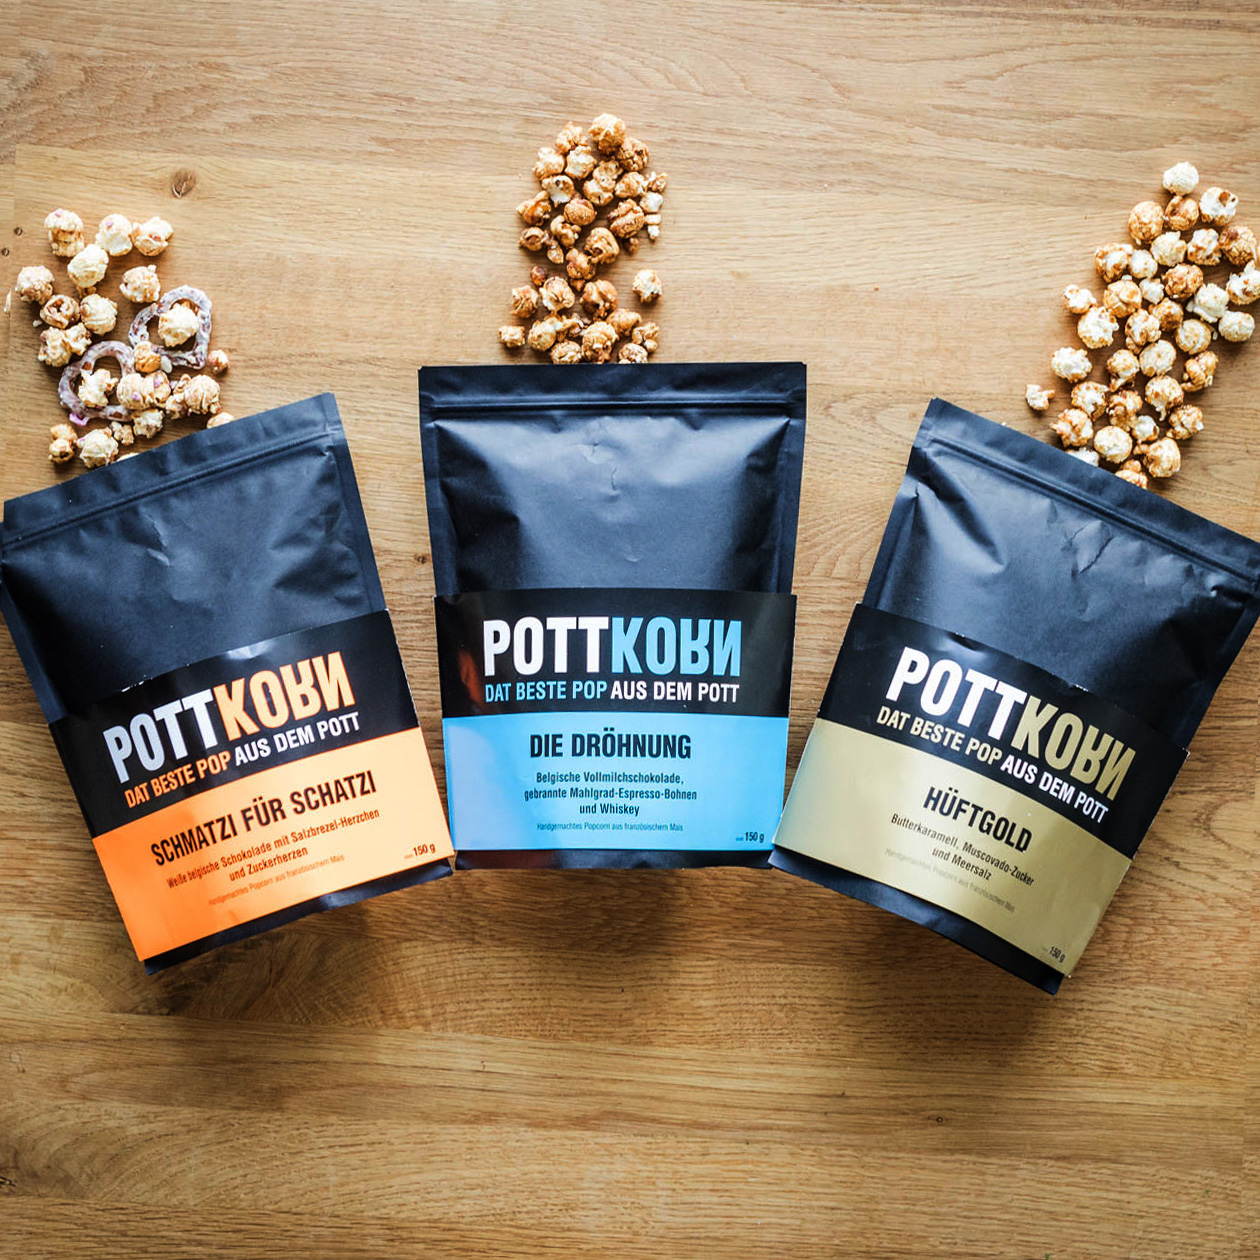 Pottkorn - Spezial Popcorn - Schmatzi für Schat...